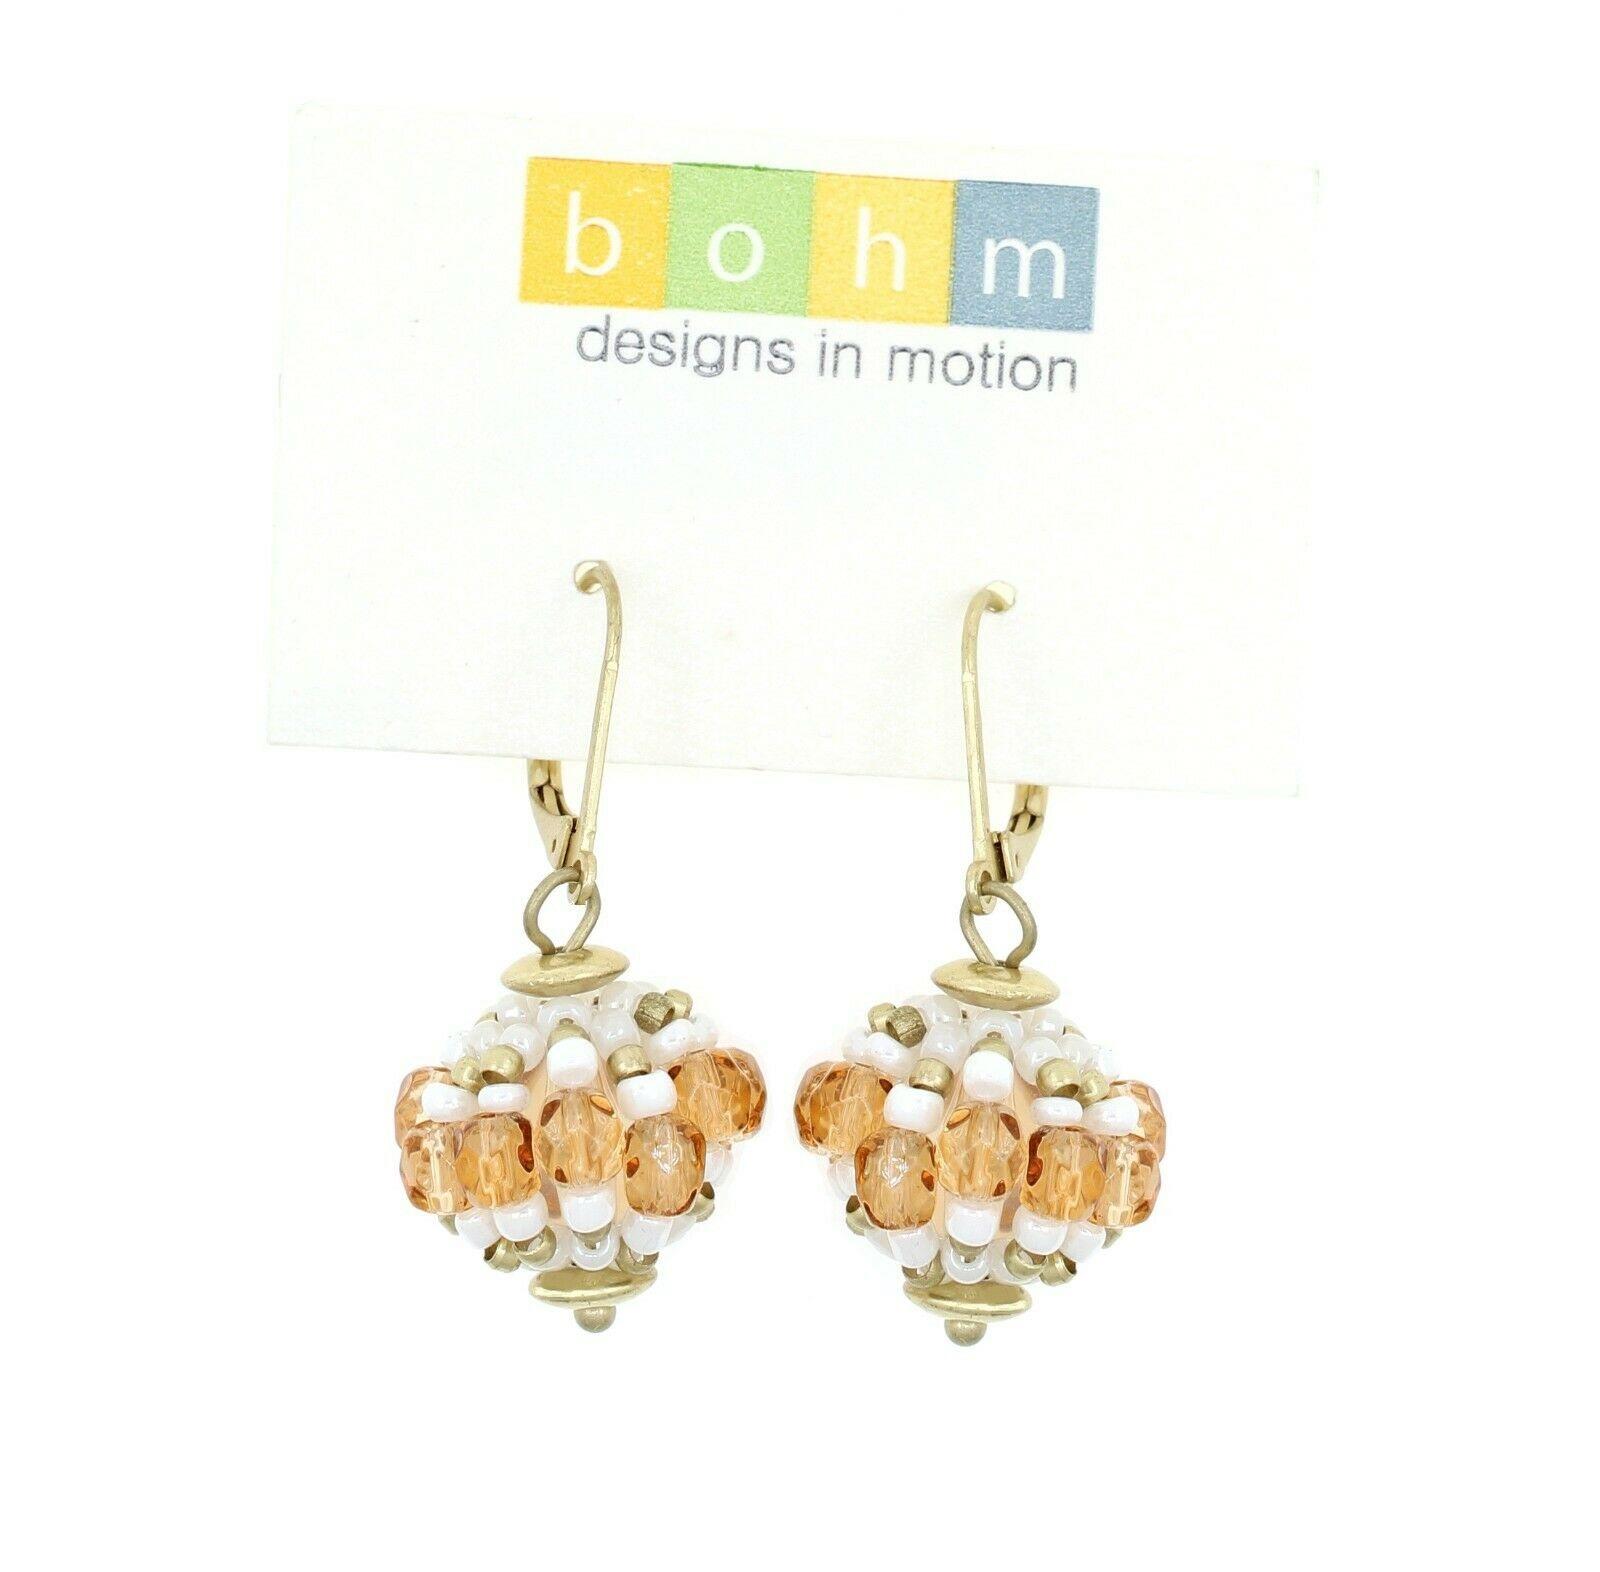 Sea-Urchin Bead Earrings - Gold Plate/Cream & Caramel Glass Beads - BOHM BNWT